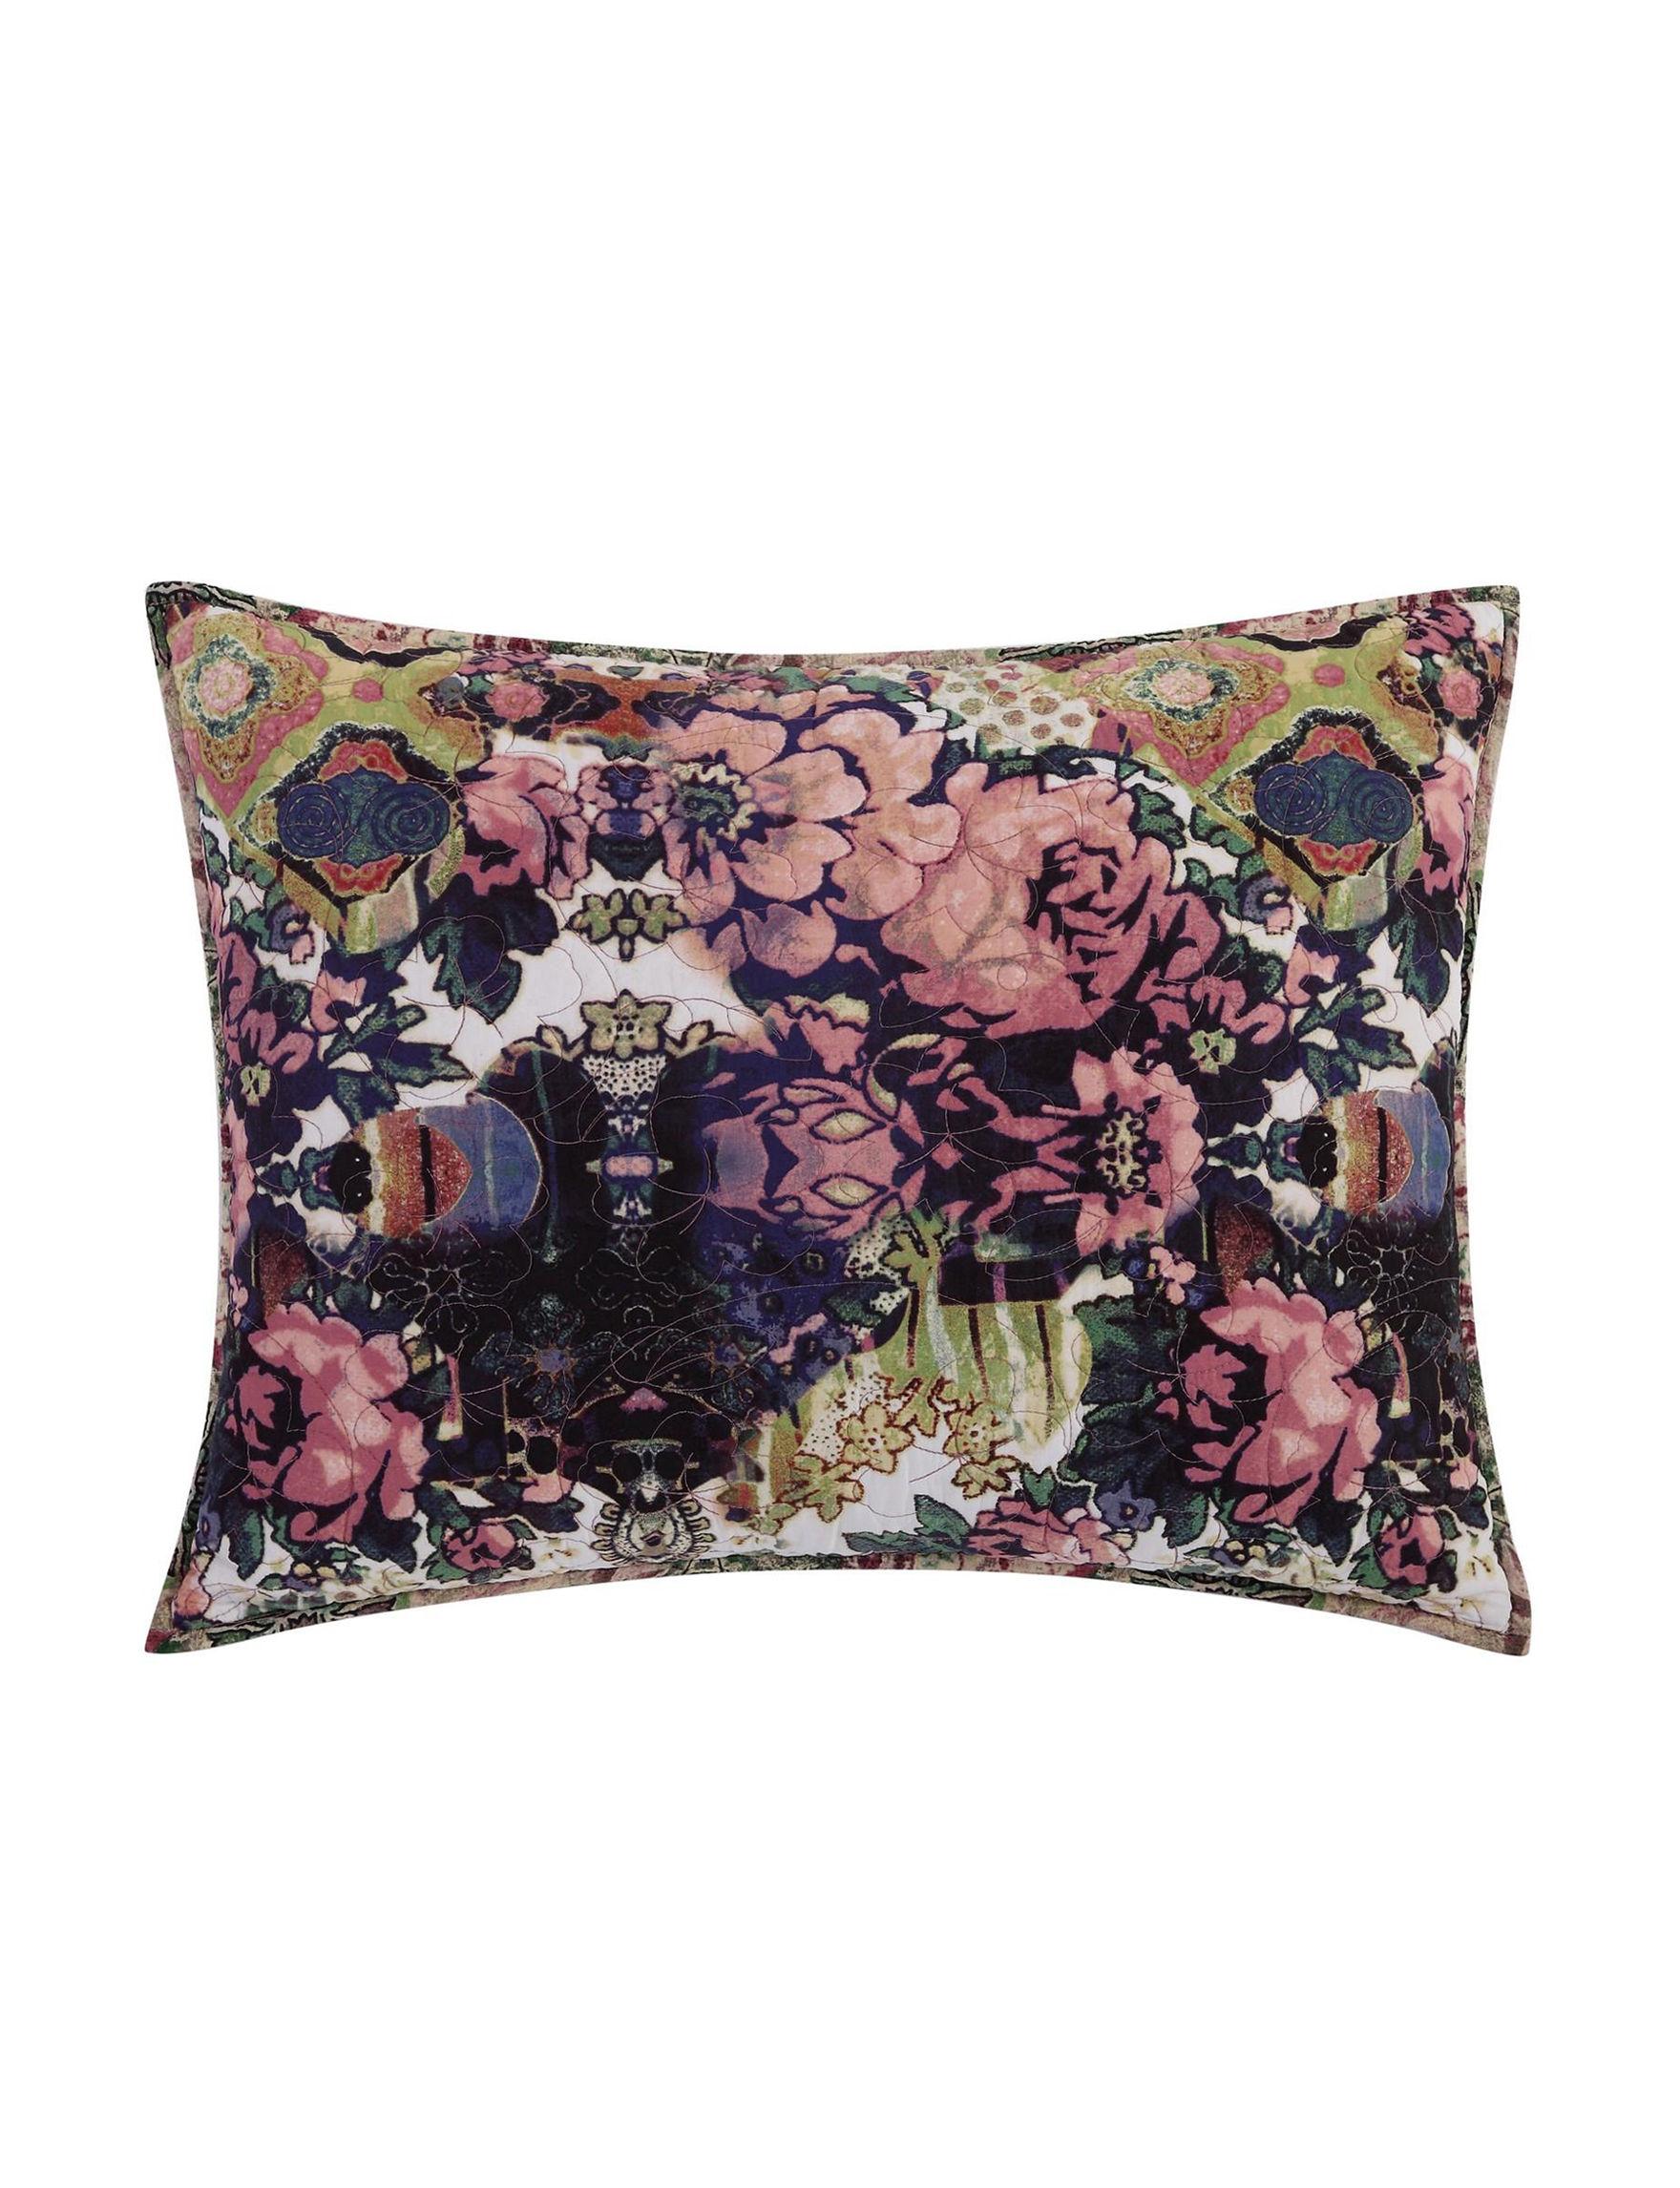 Tracy Porter Green Multi Pillow Shams